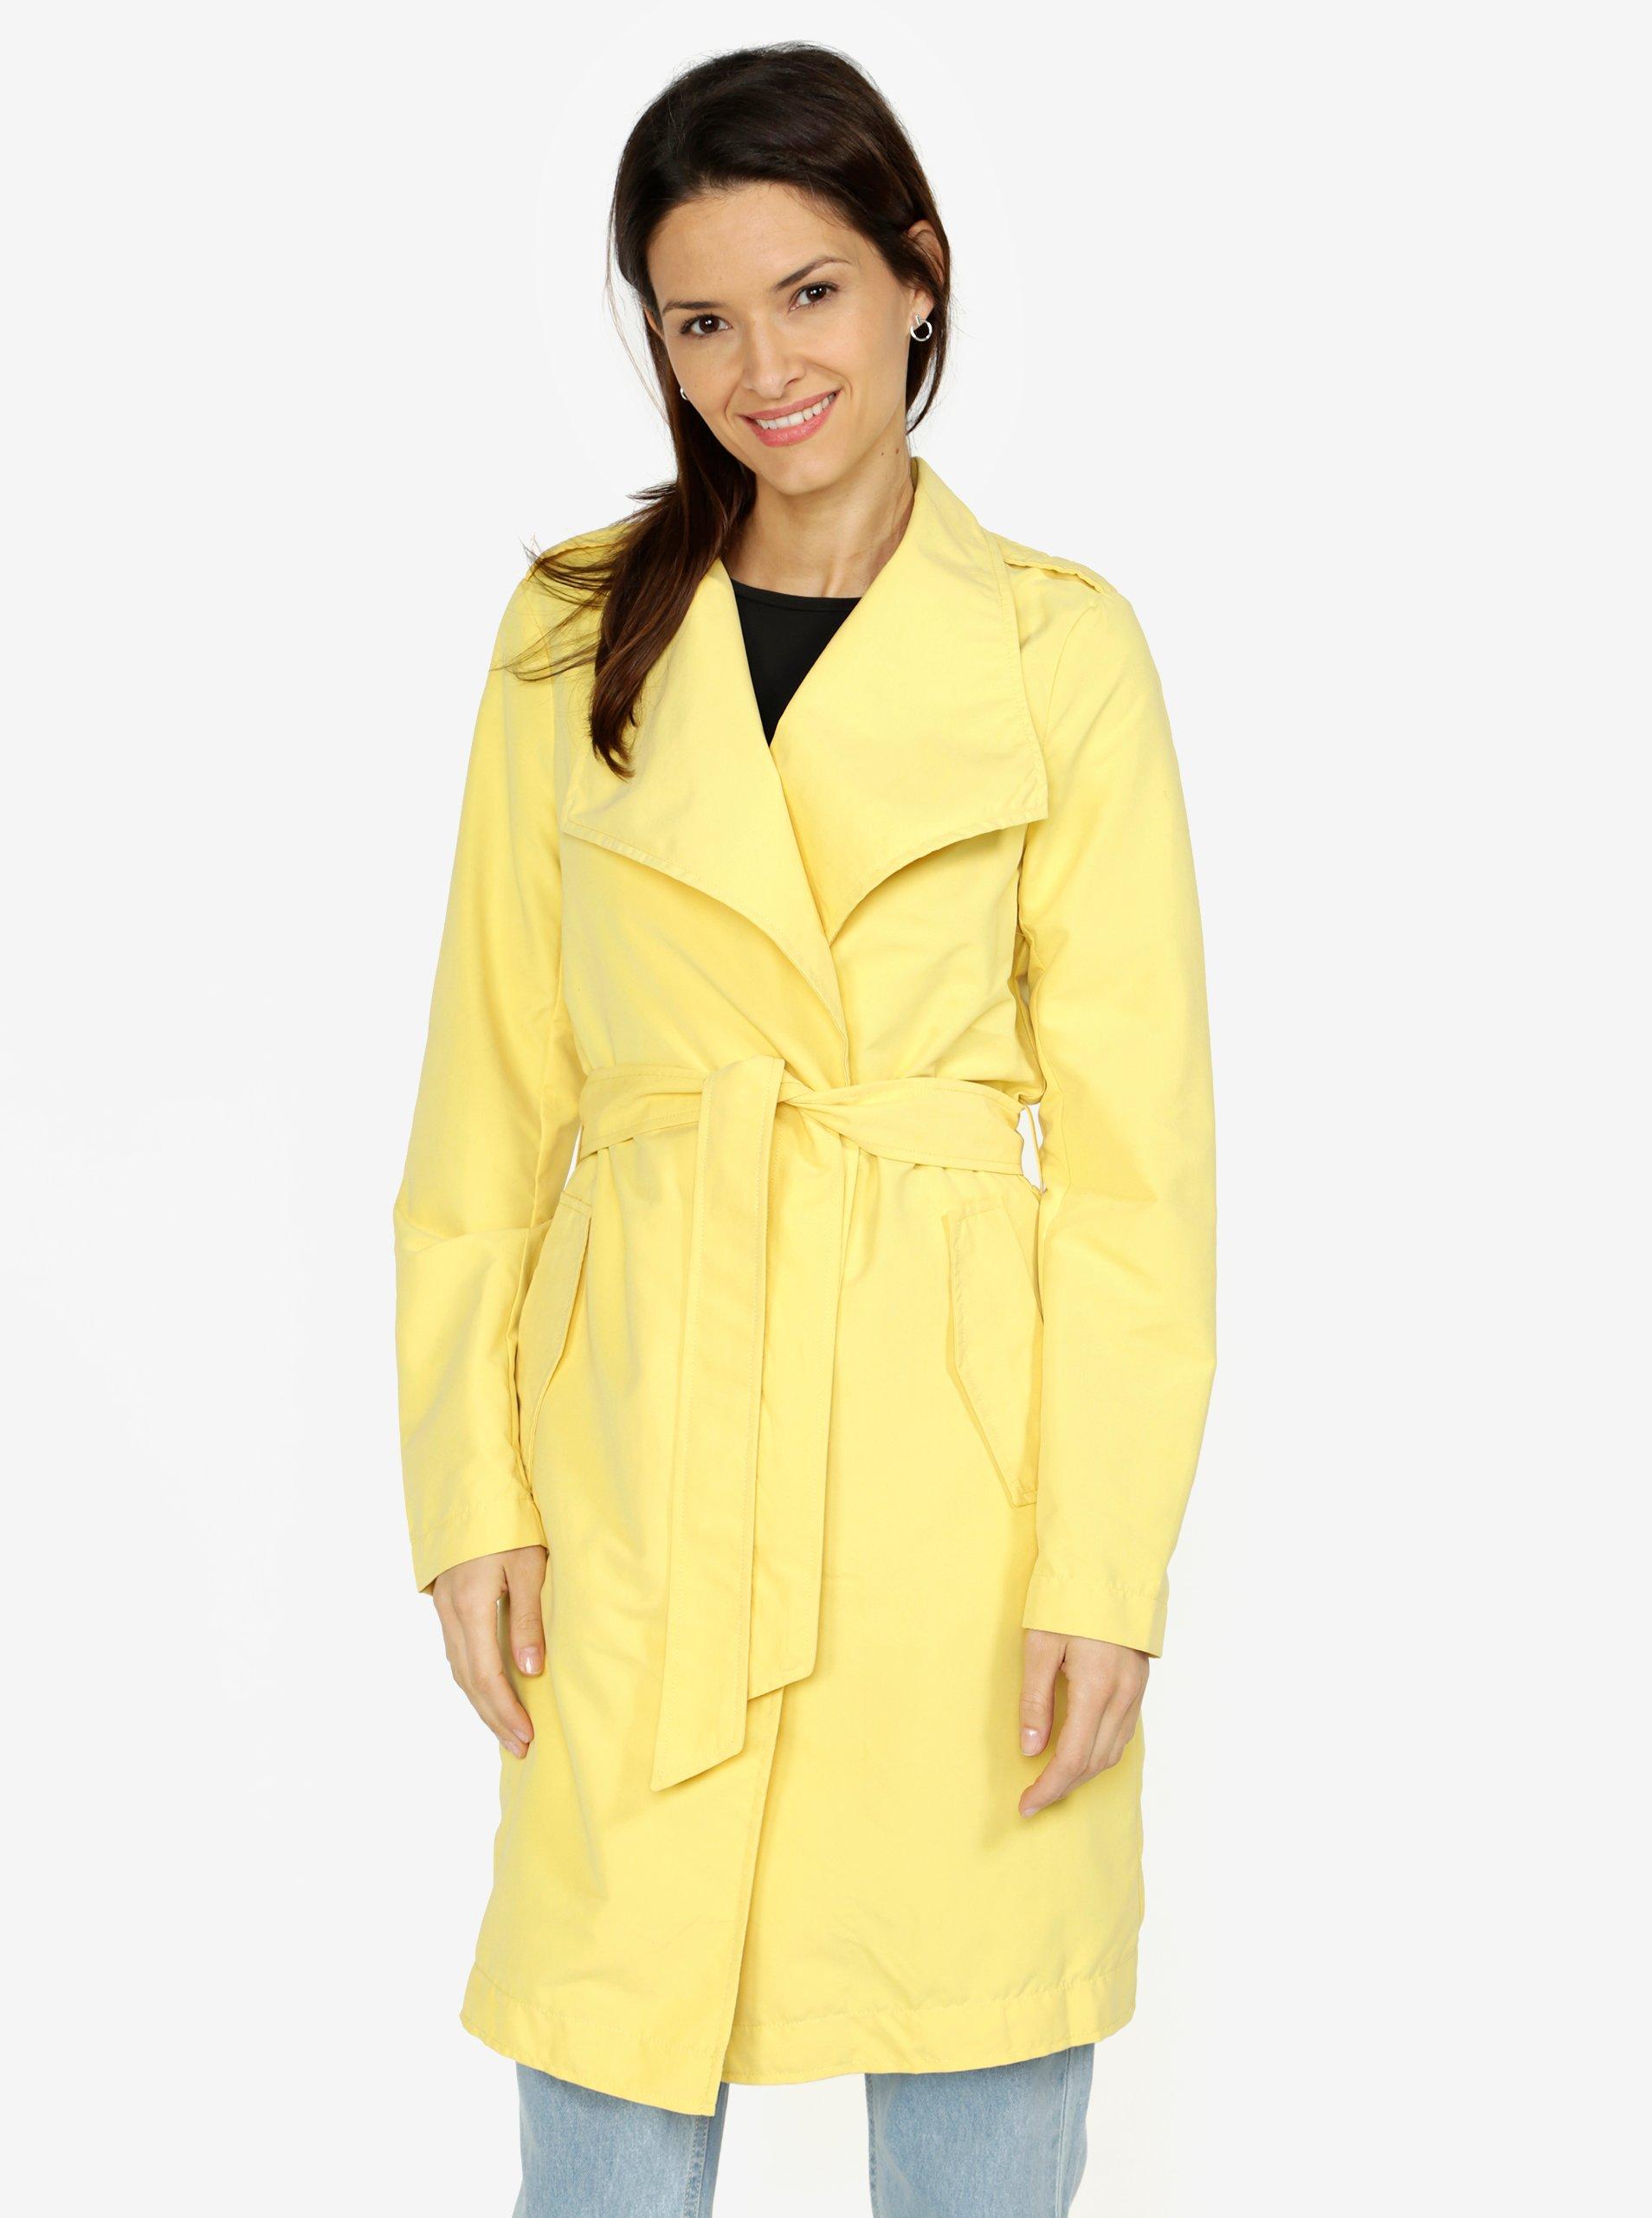 Žltý kabát VERO MODA Elina  2e088dd2fdc